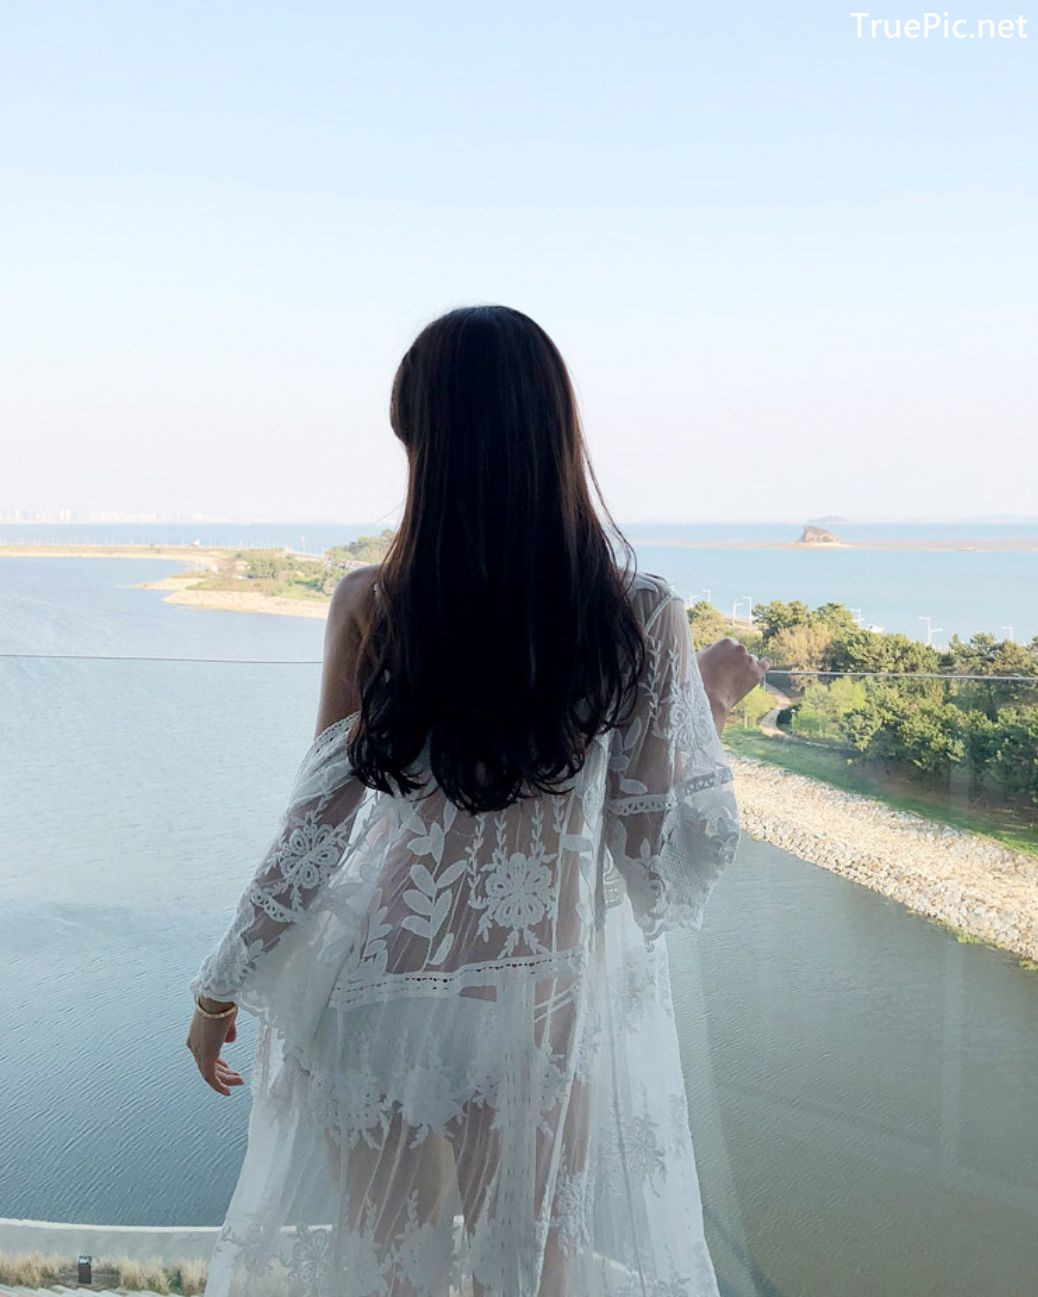 Image Korean Fashion Model - Kang Eun Wook - White Apple Swimsuit - TruePic.net - Picture-6